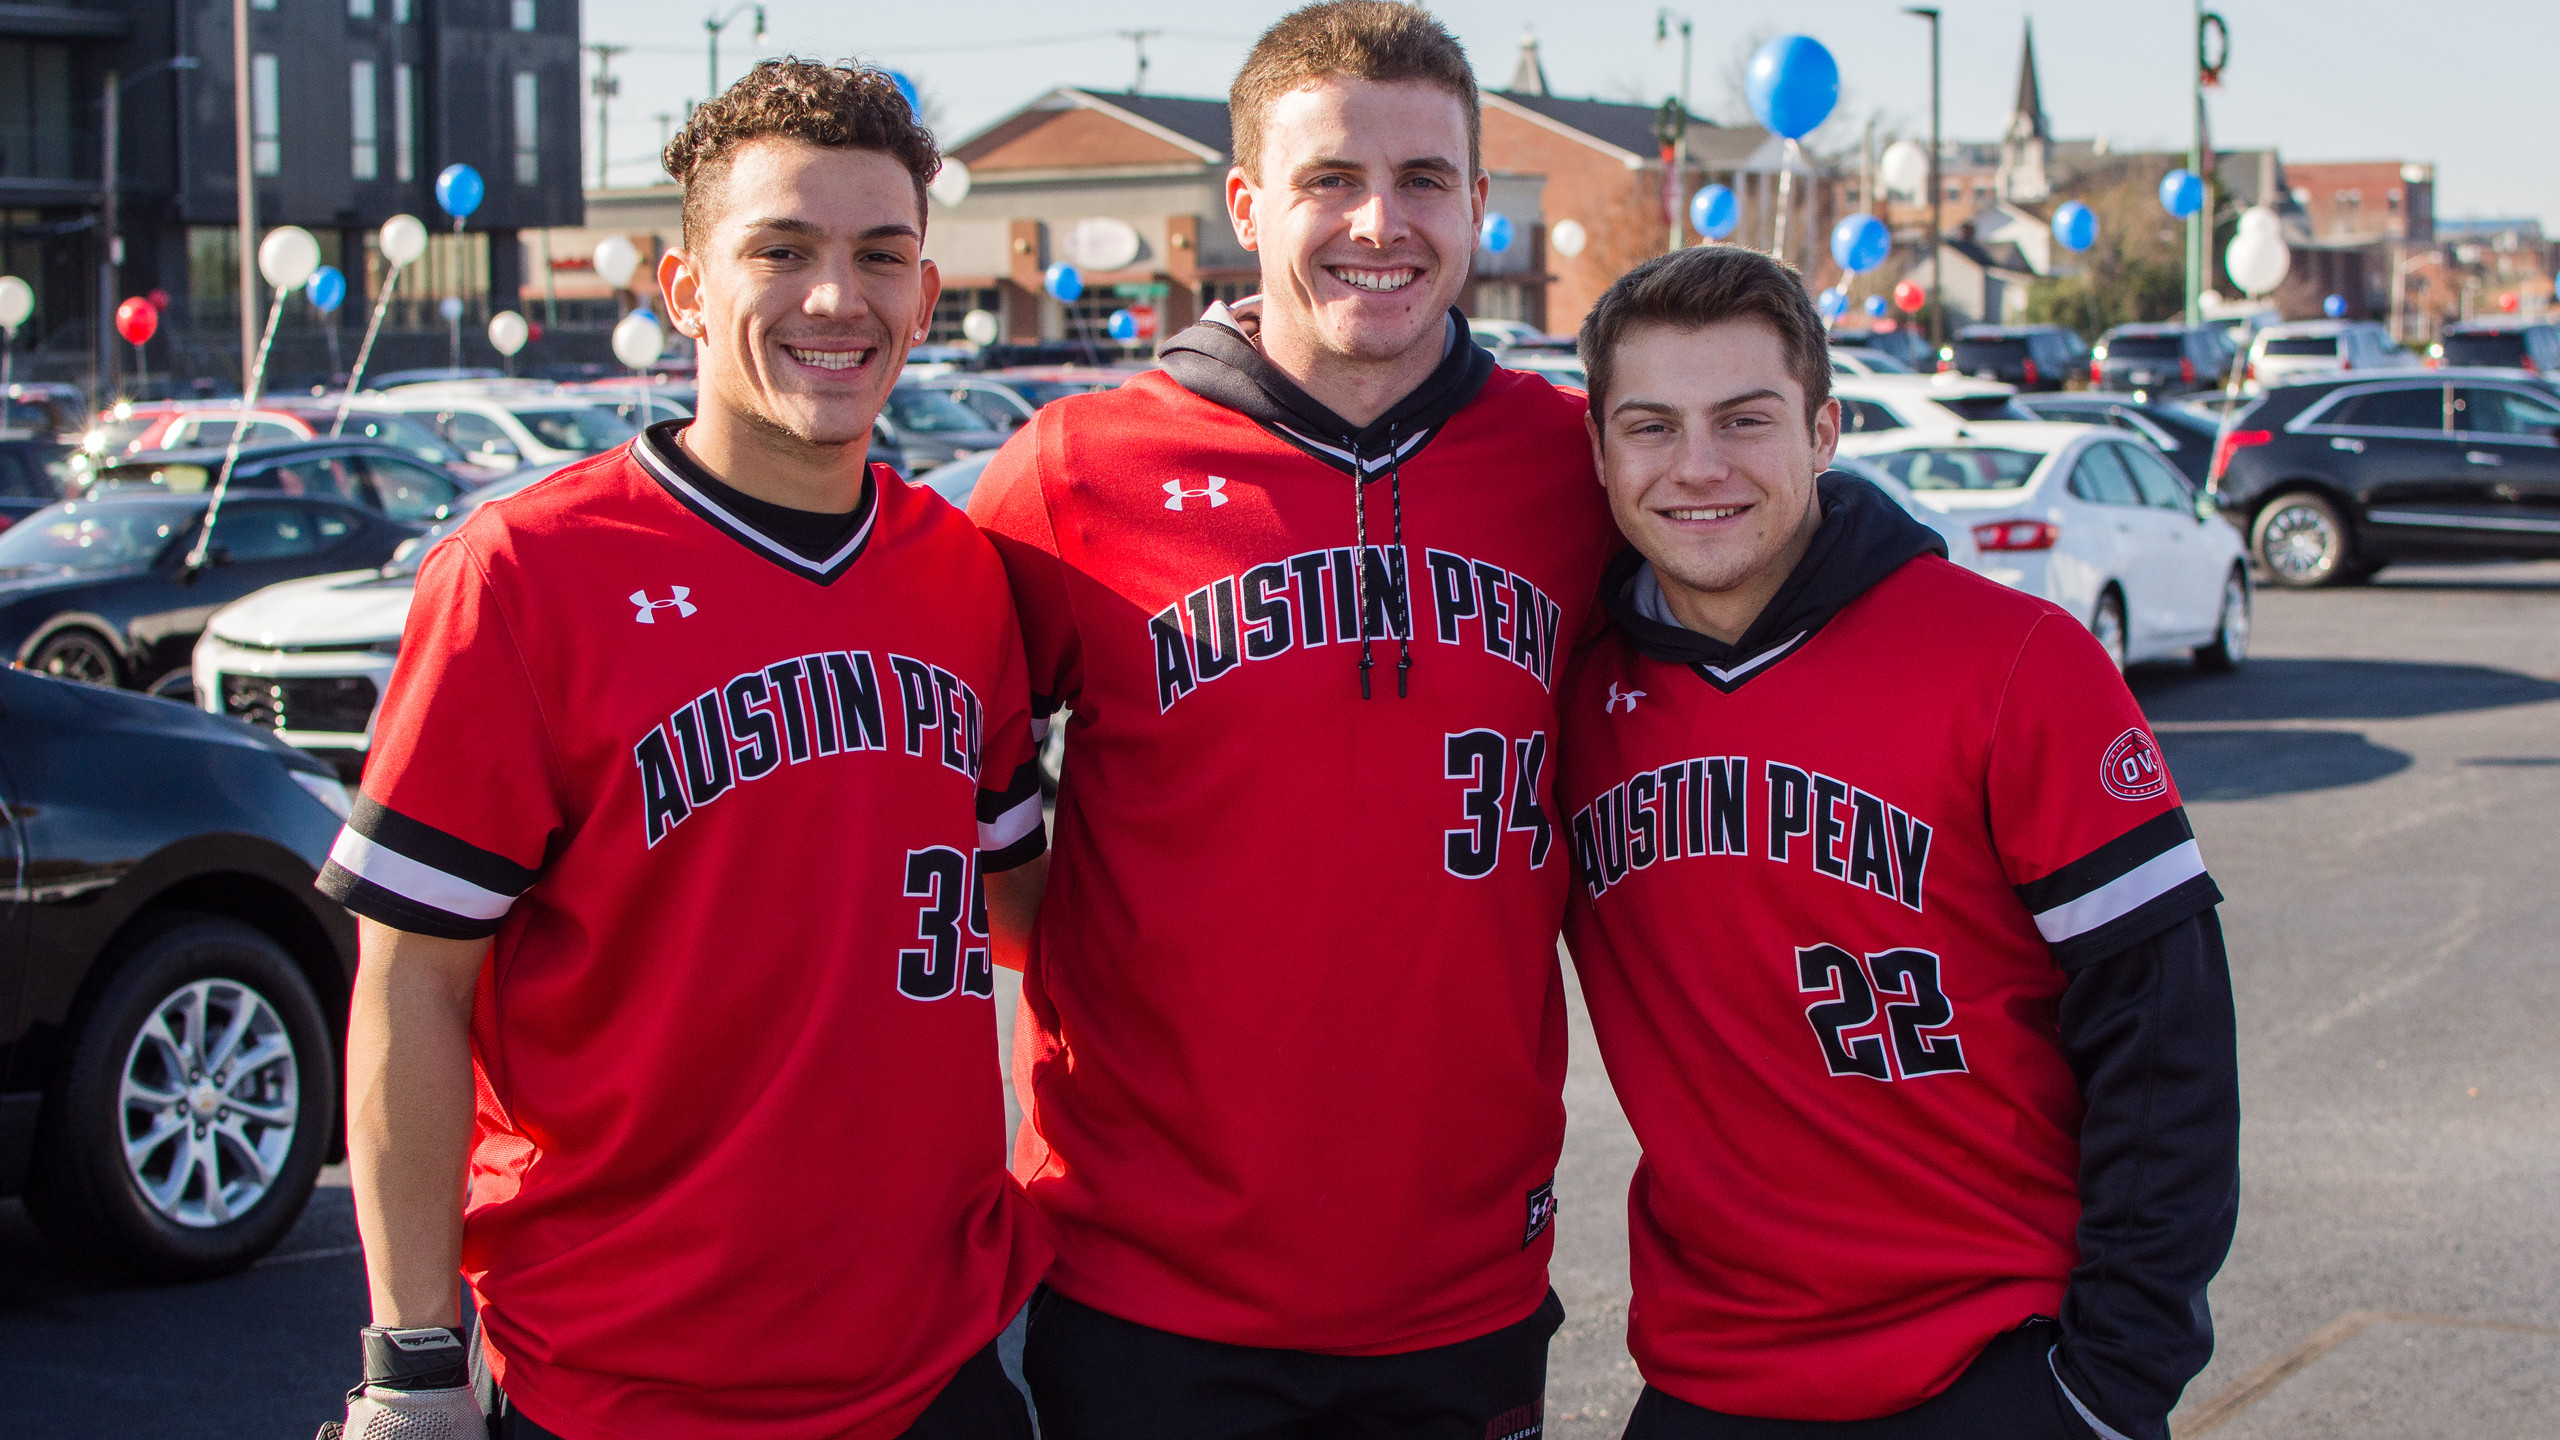 Matther Joslin, Noah Ludy, and Gino Auro